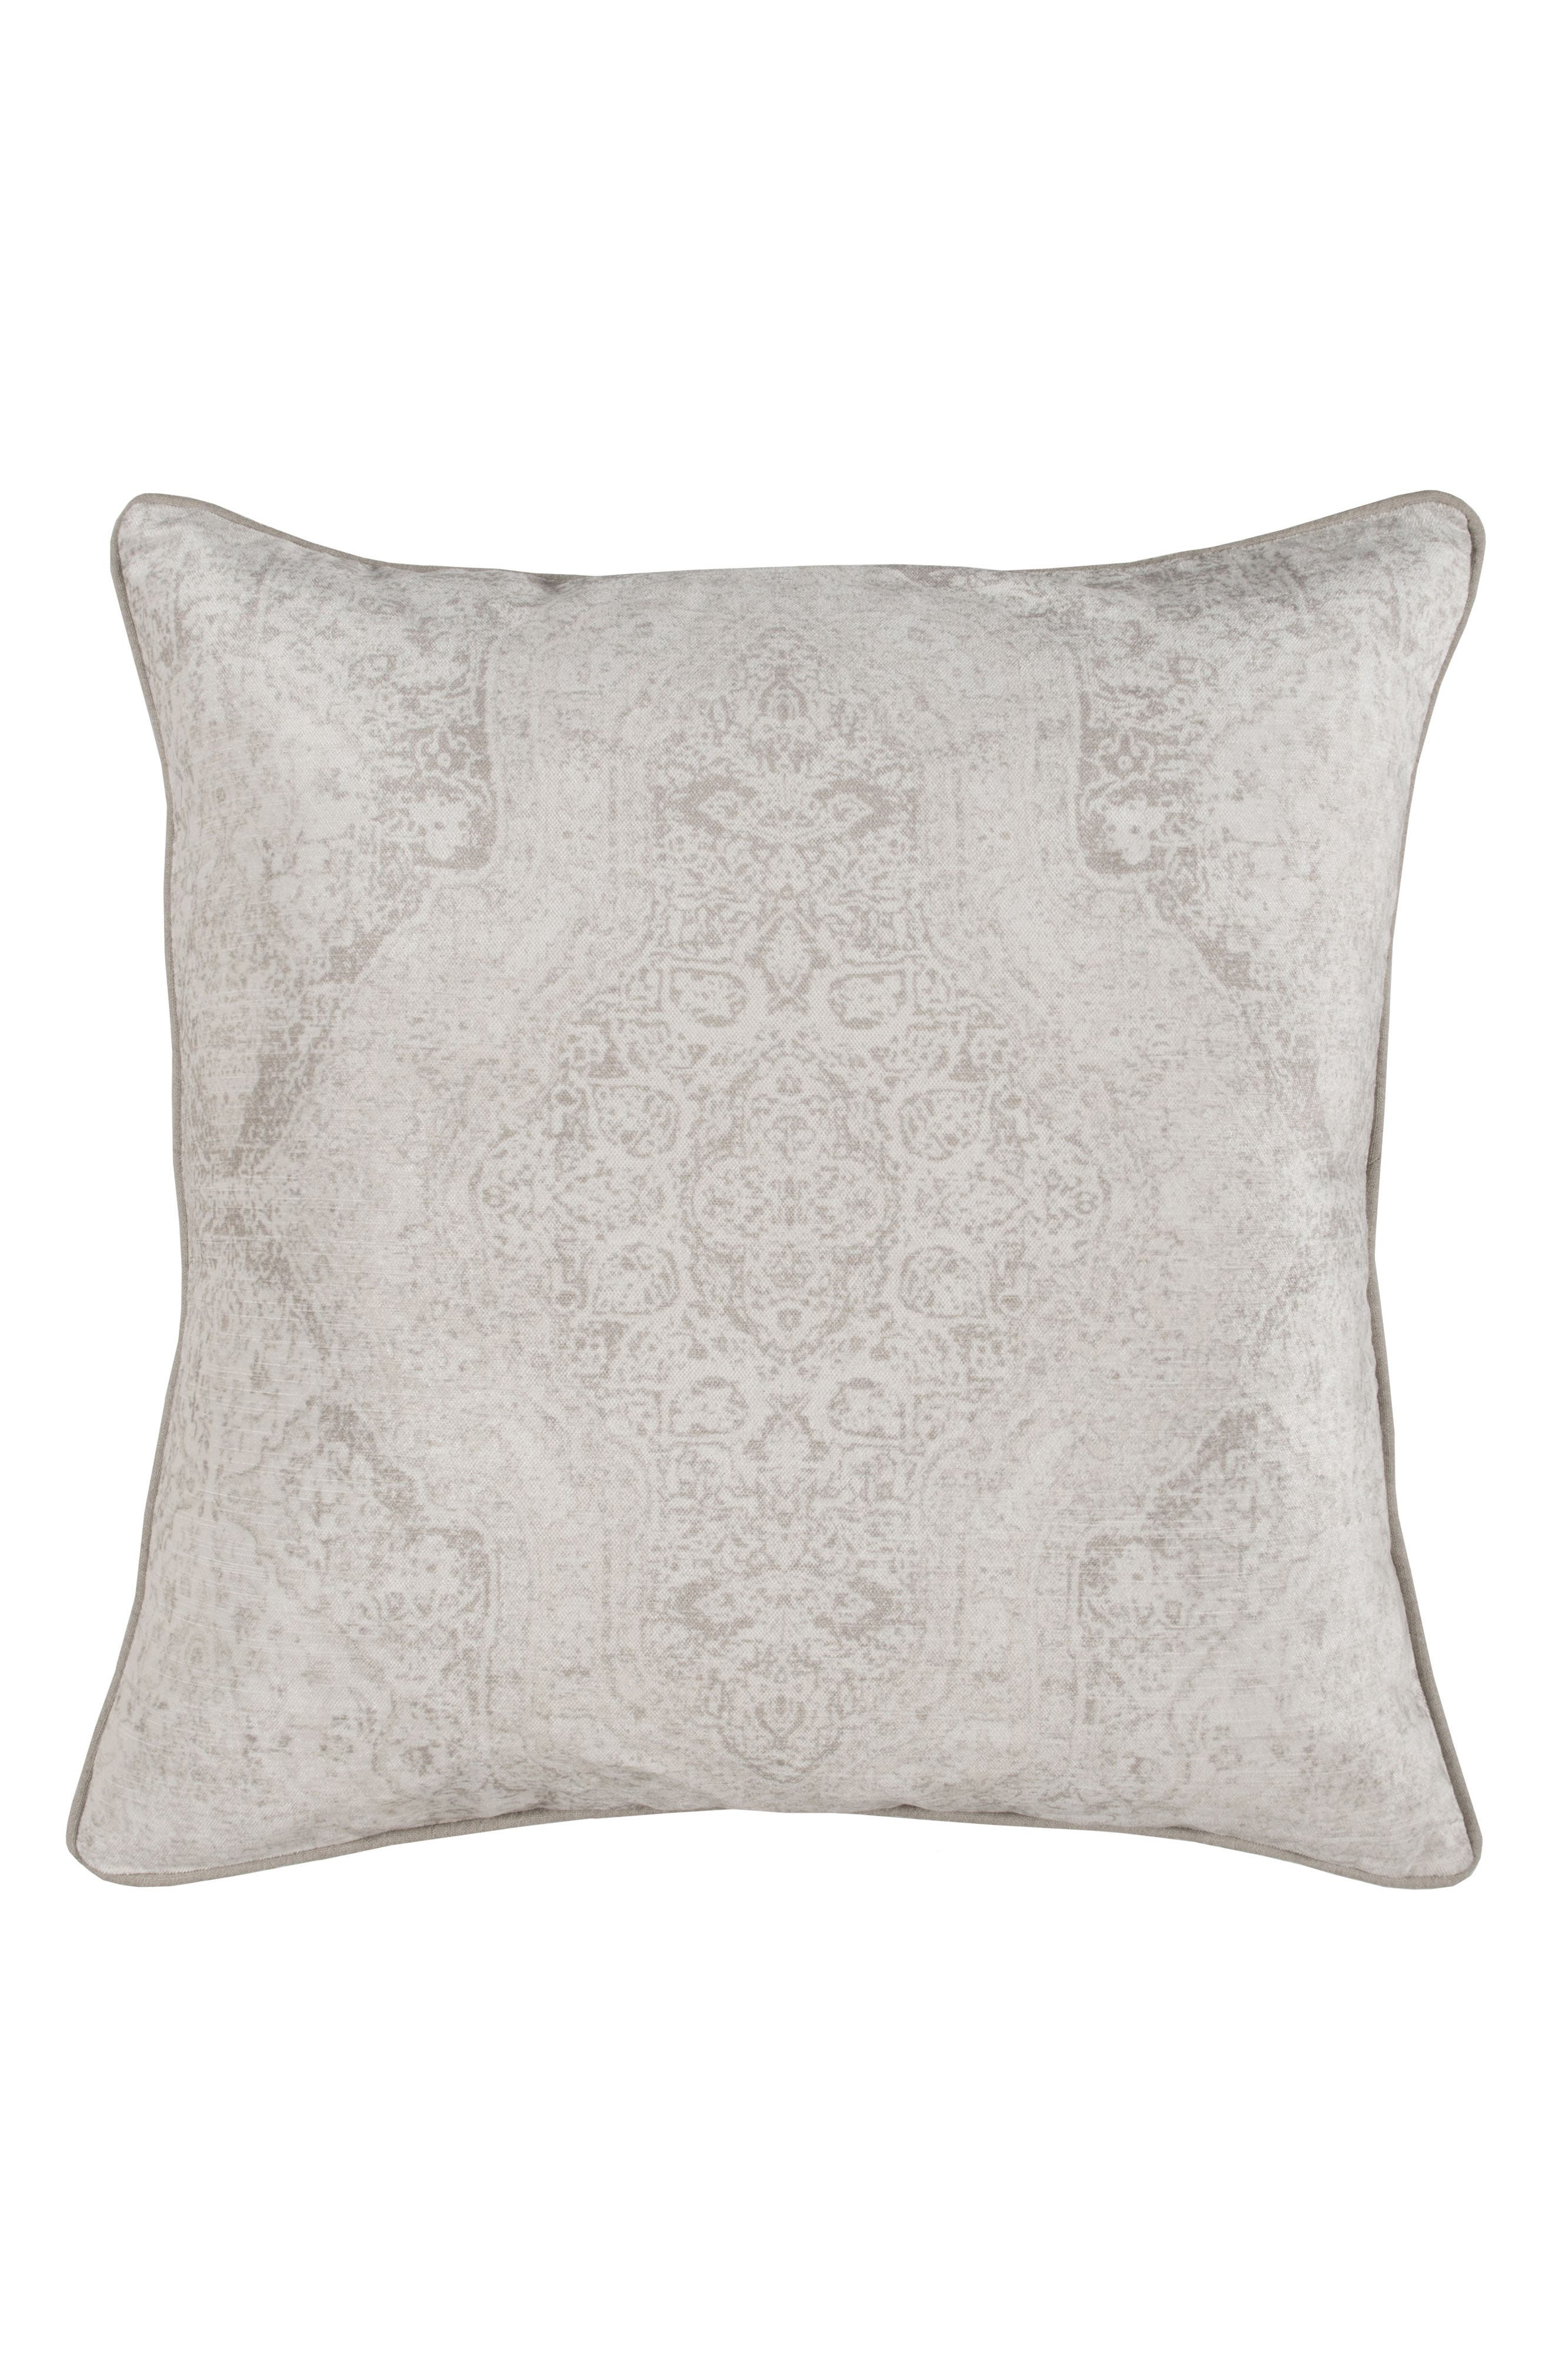 Luri Accent Pillow,                             Main thumbnail 1, color,                             NATURAL